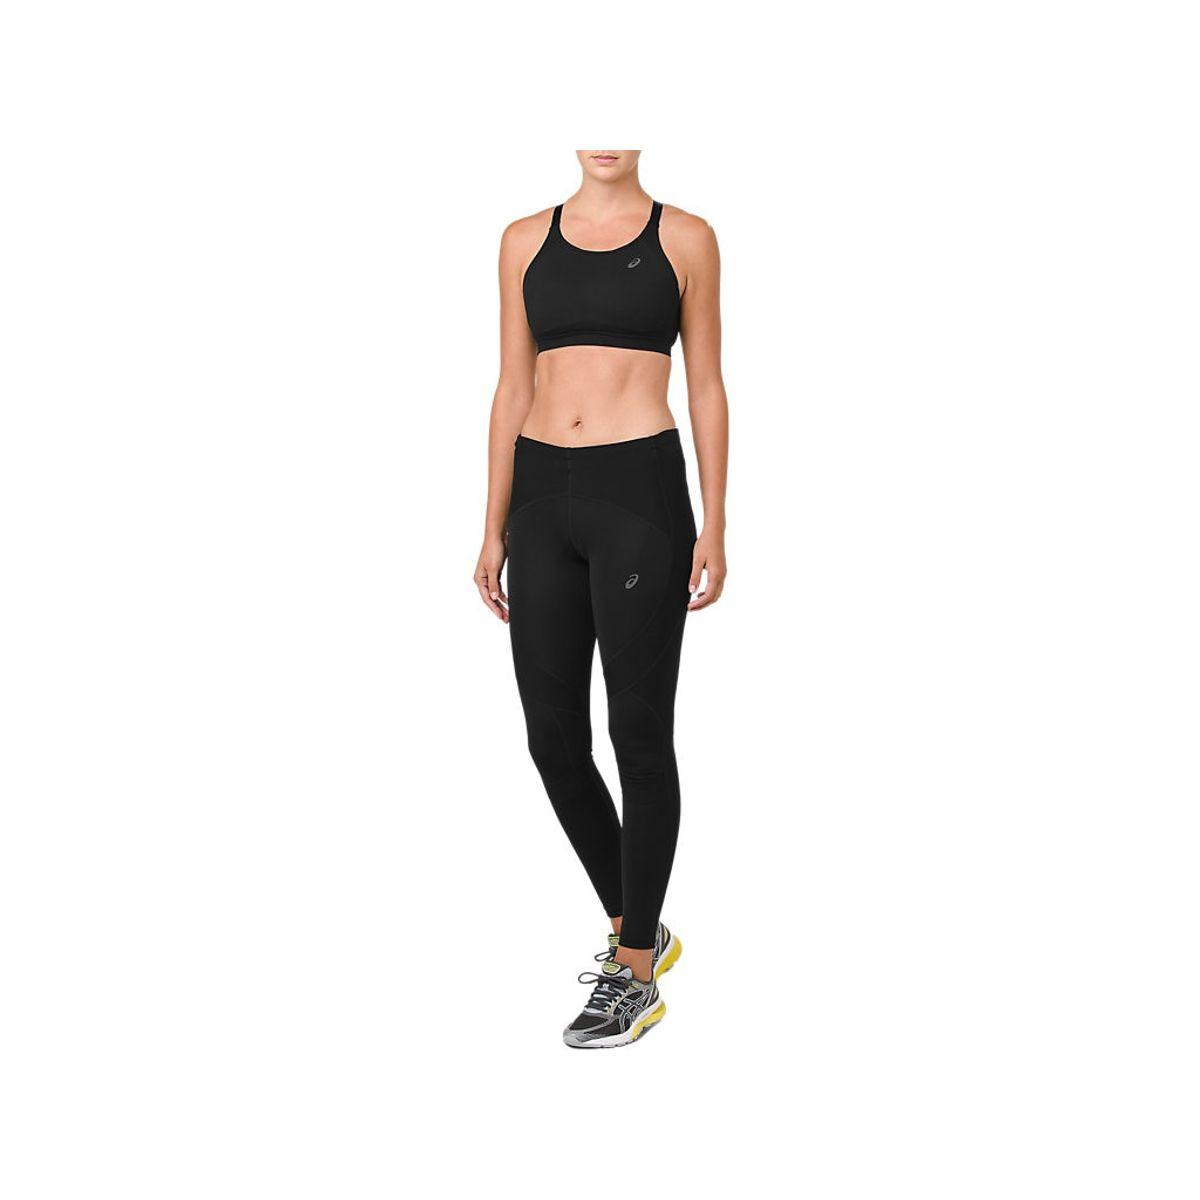 Calca-Legging-Asics-de-Compressao-Leg-Balance-Tight-2---Feminino---Preto